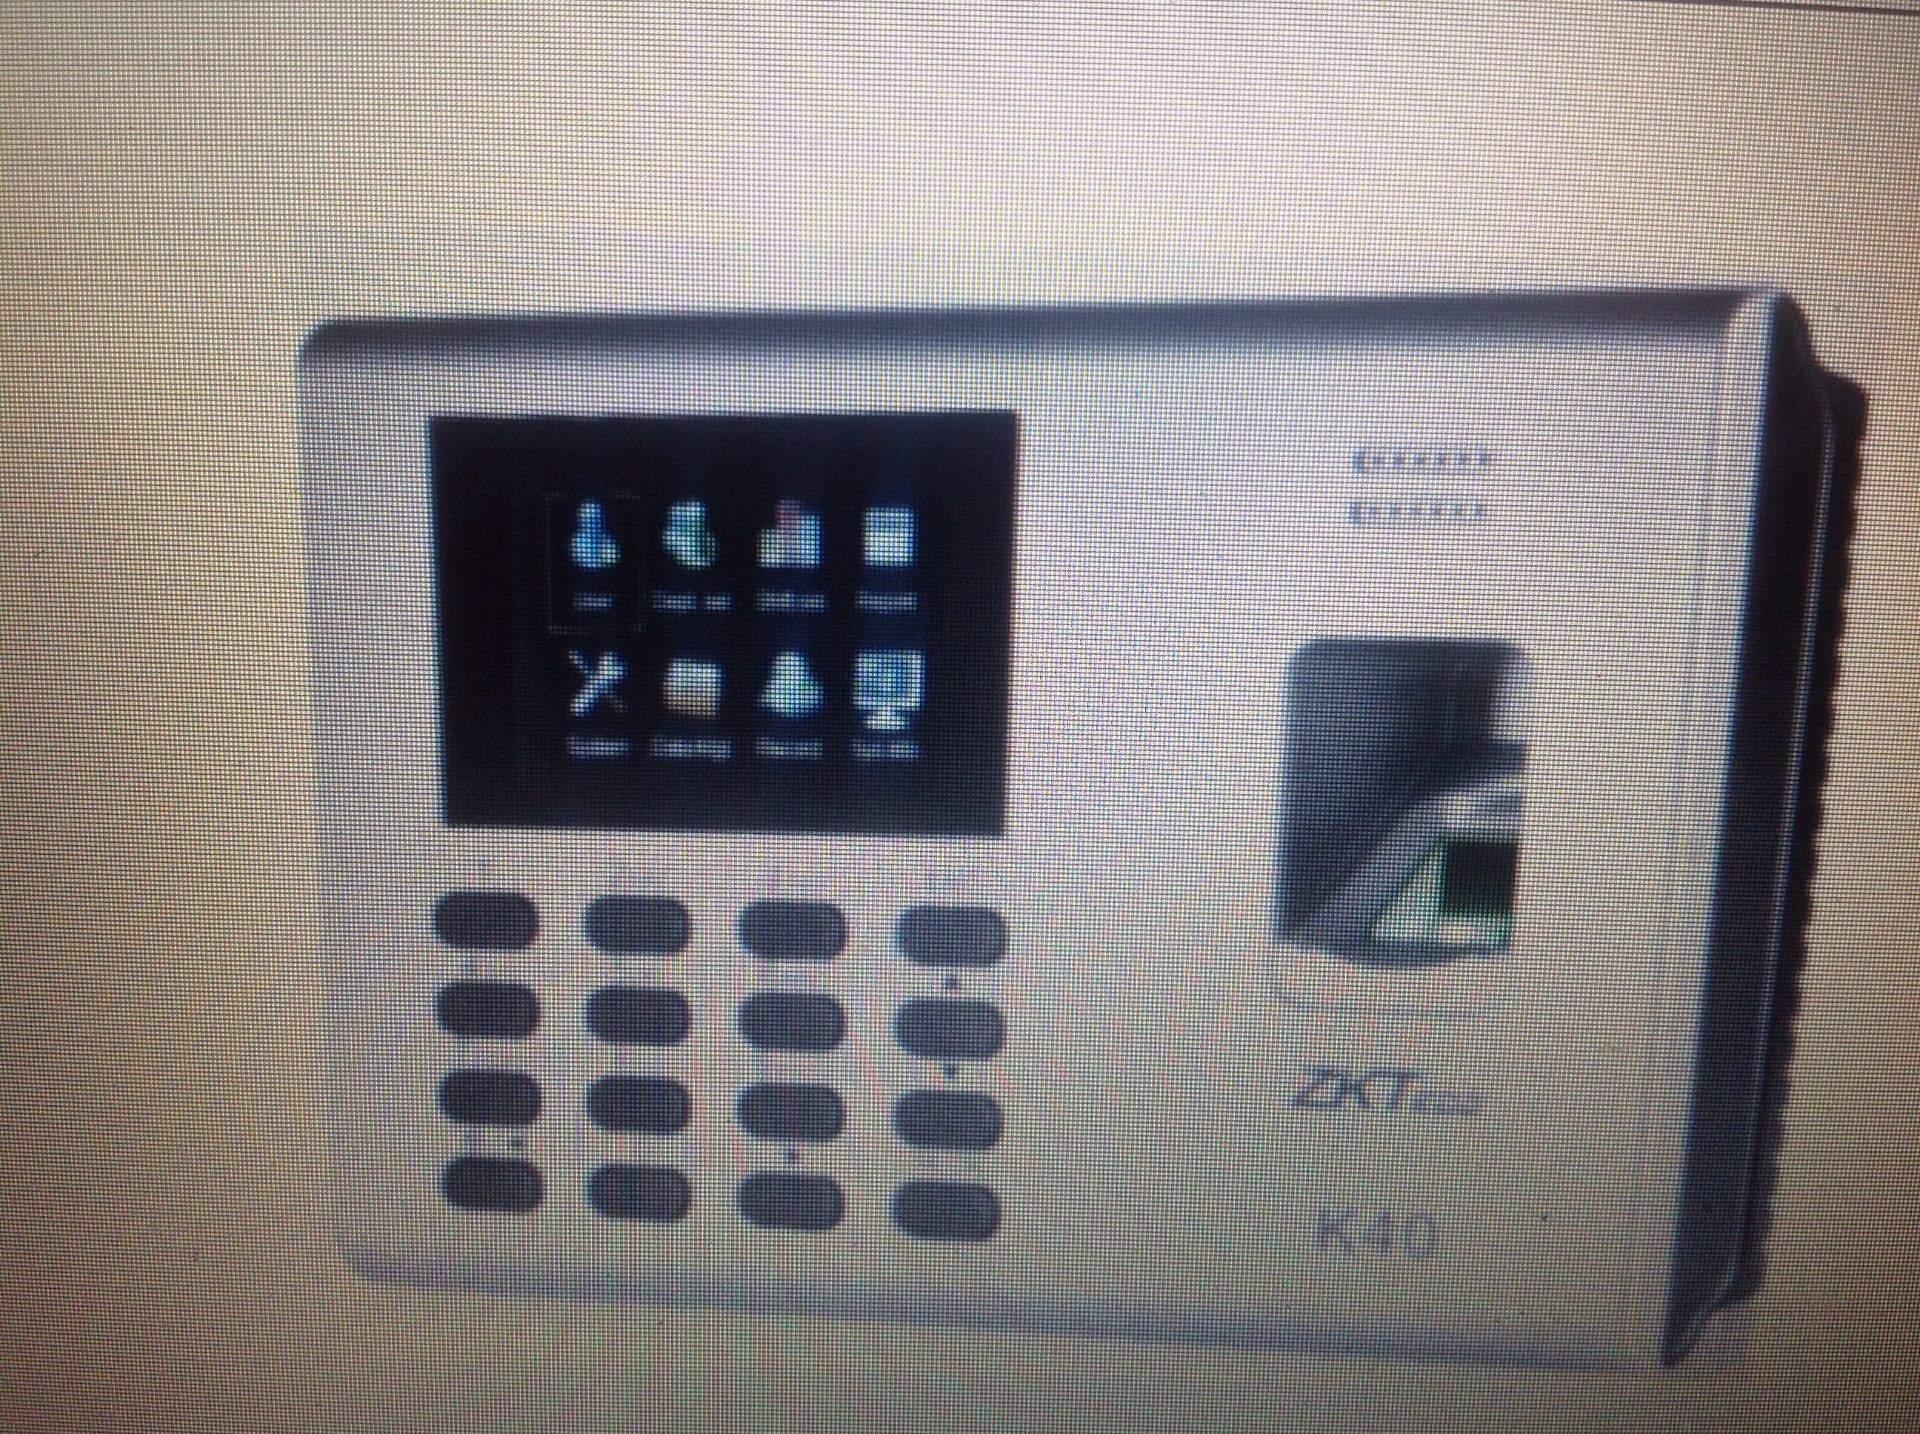 Top 100 Essl Biometric Attendance System Dealers in Mumbai - Best